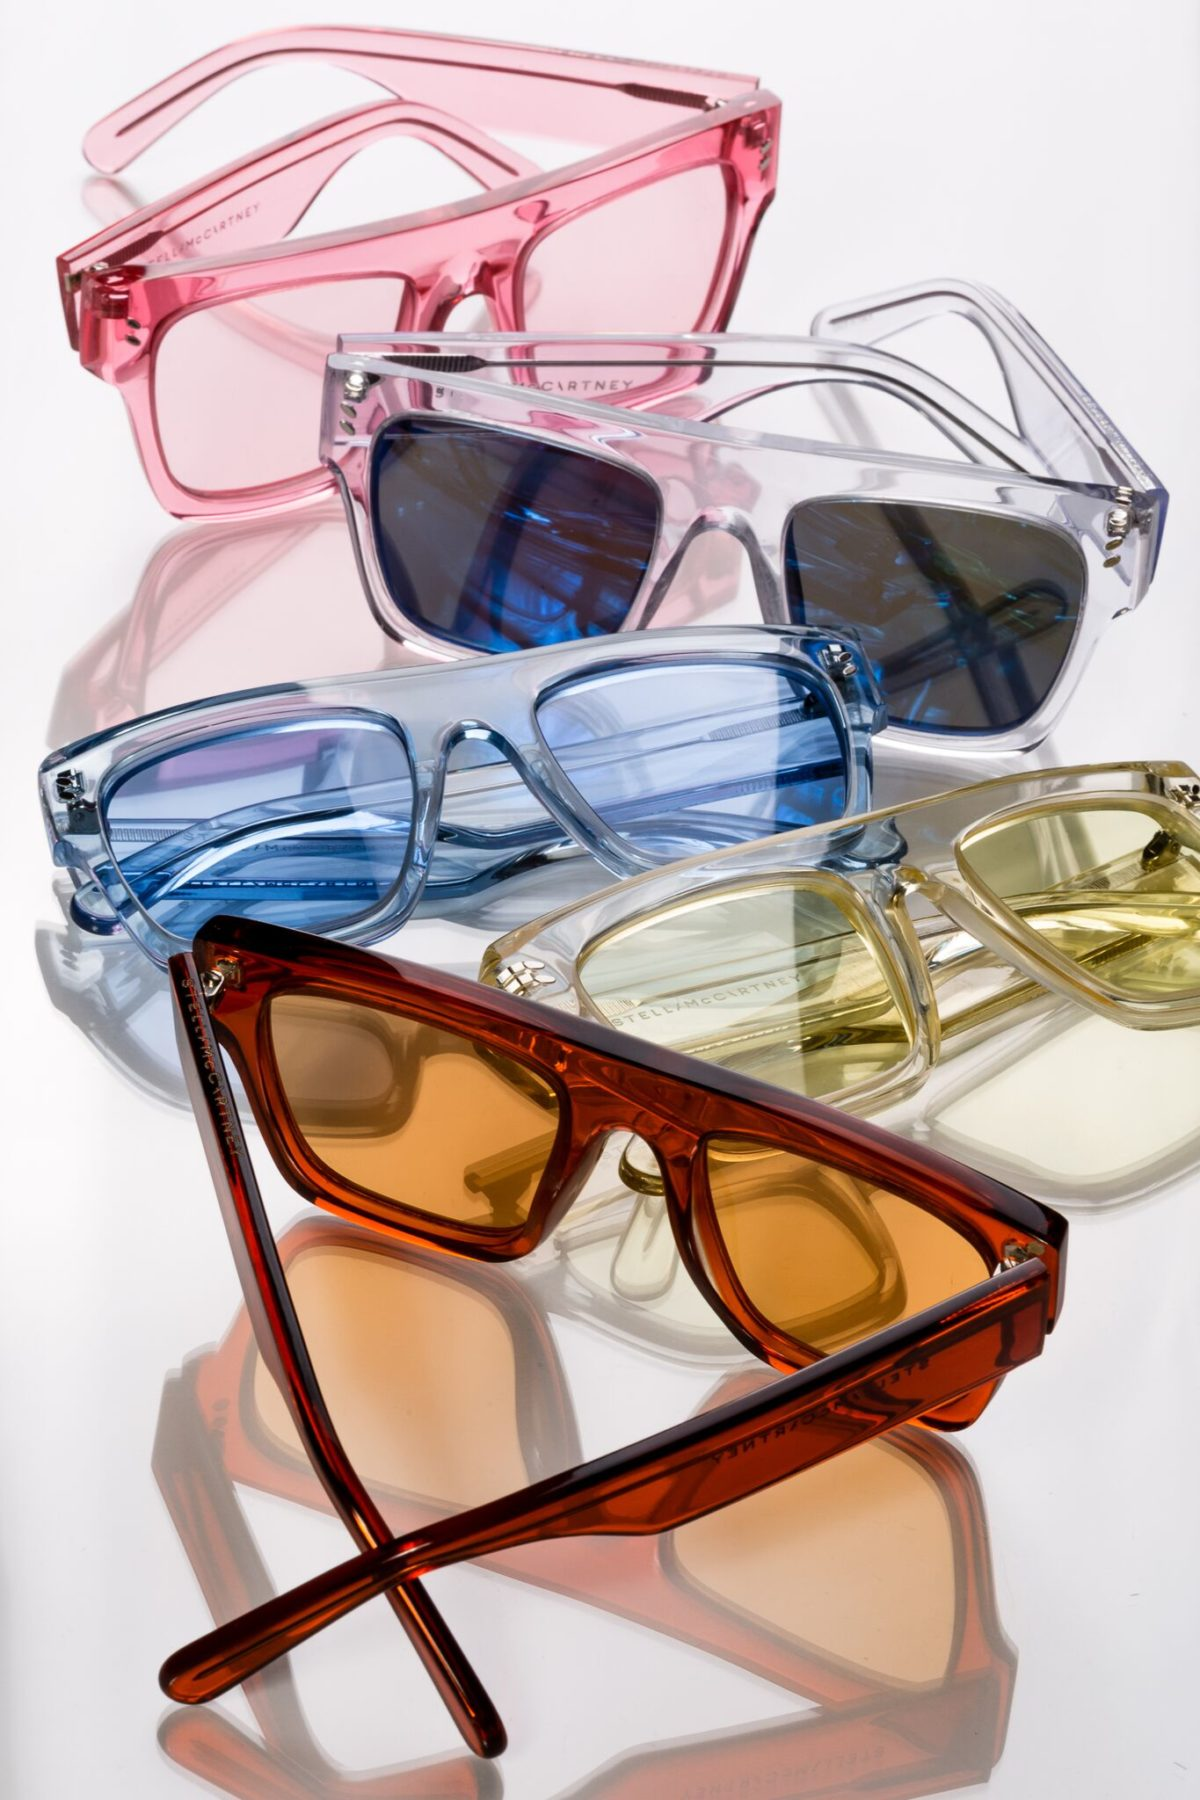 Ici Ice Stella McCartney Eyewear Summer 2018